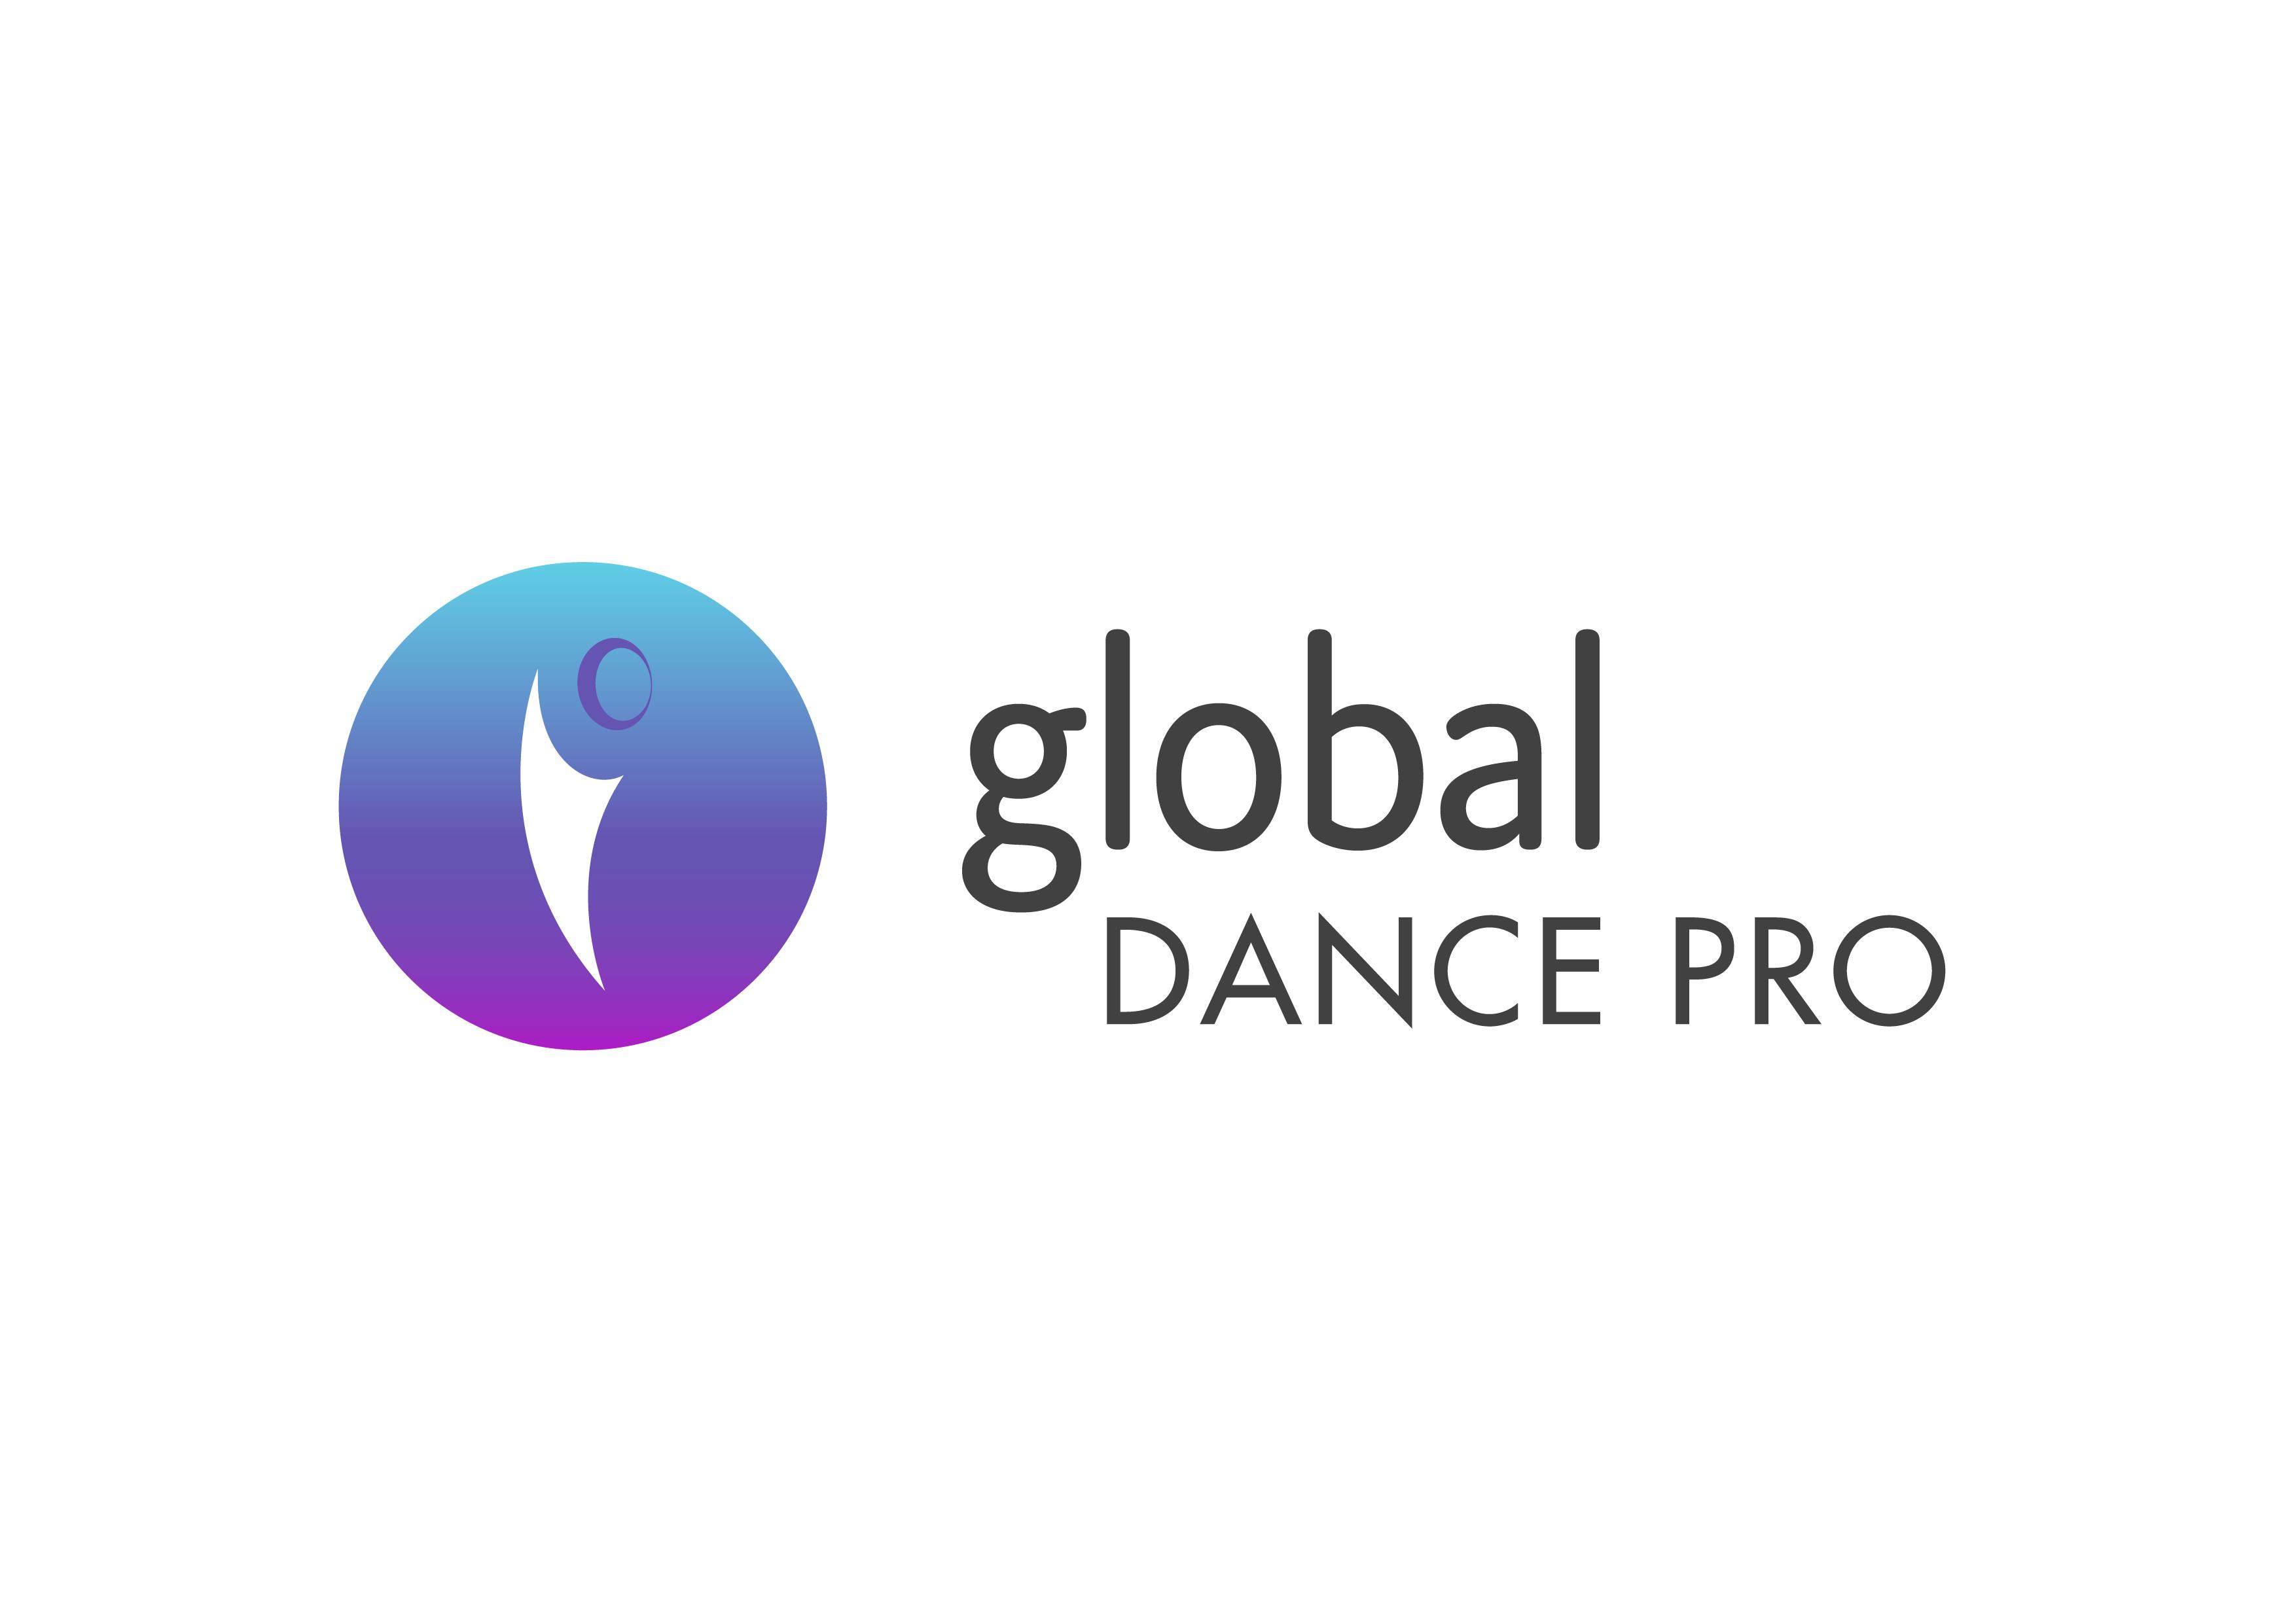 Global Dance Pro